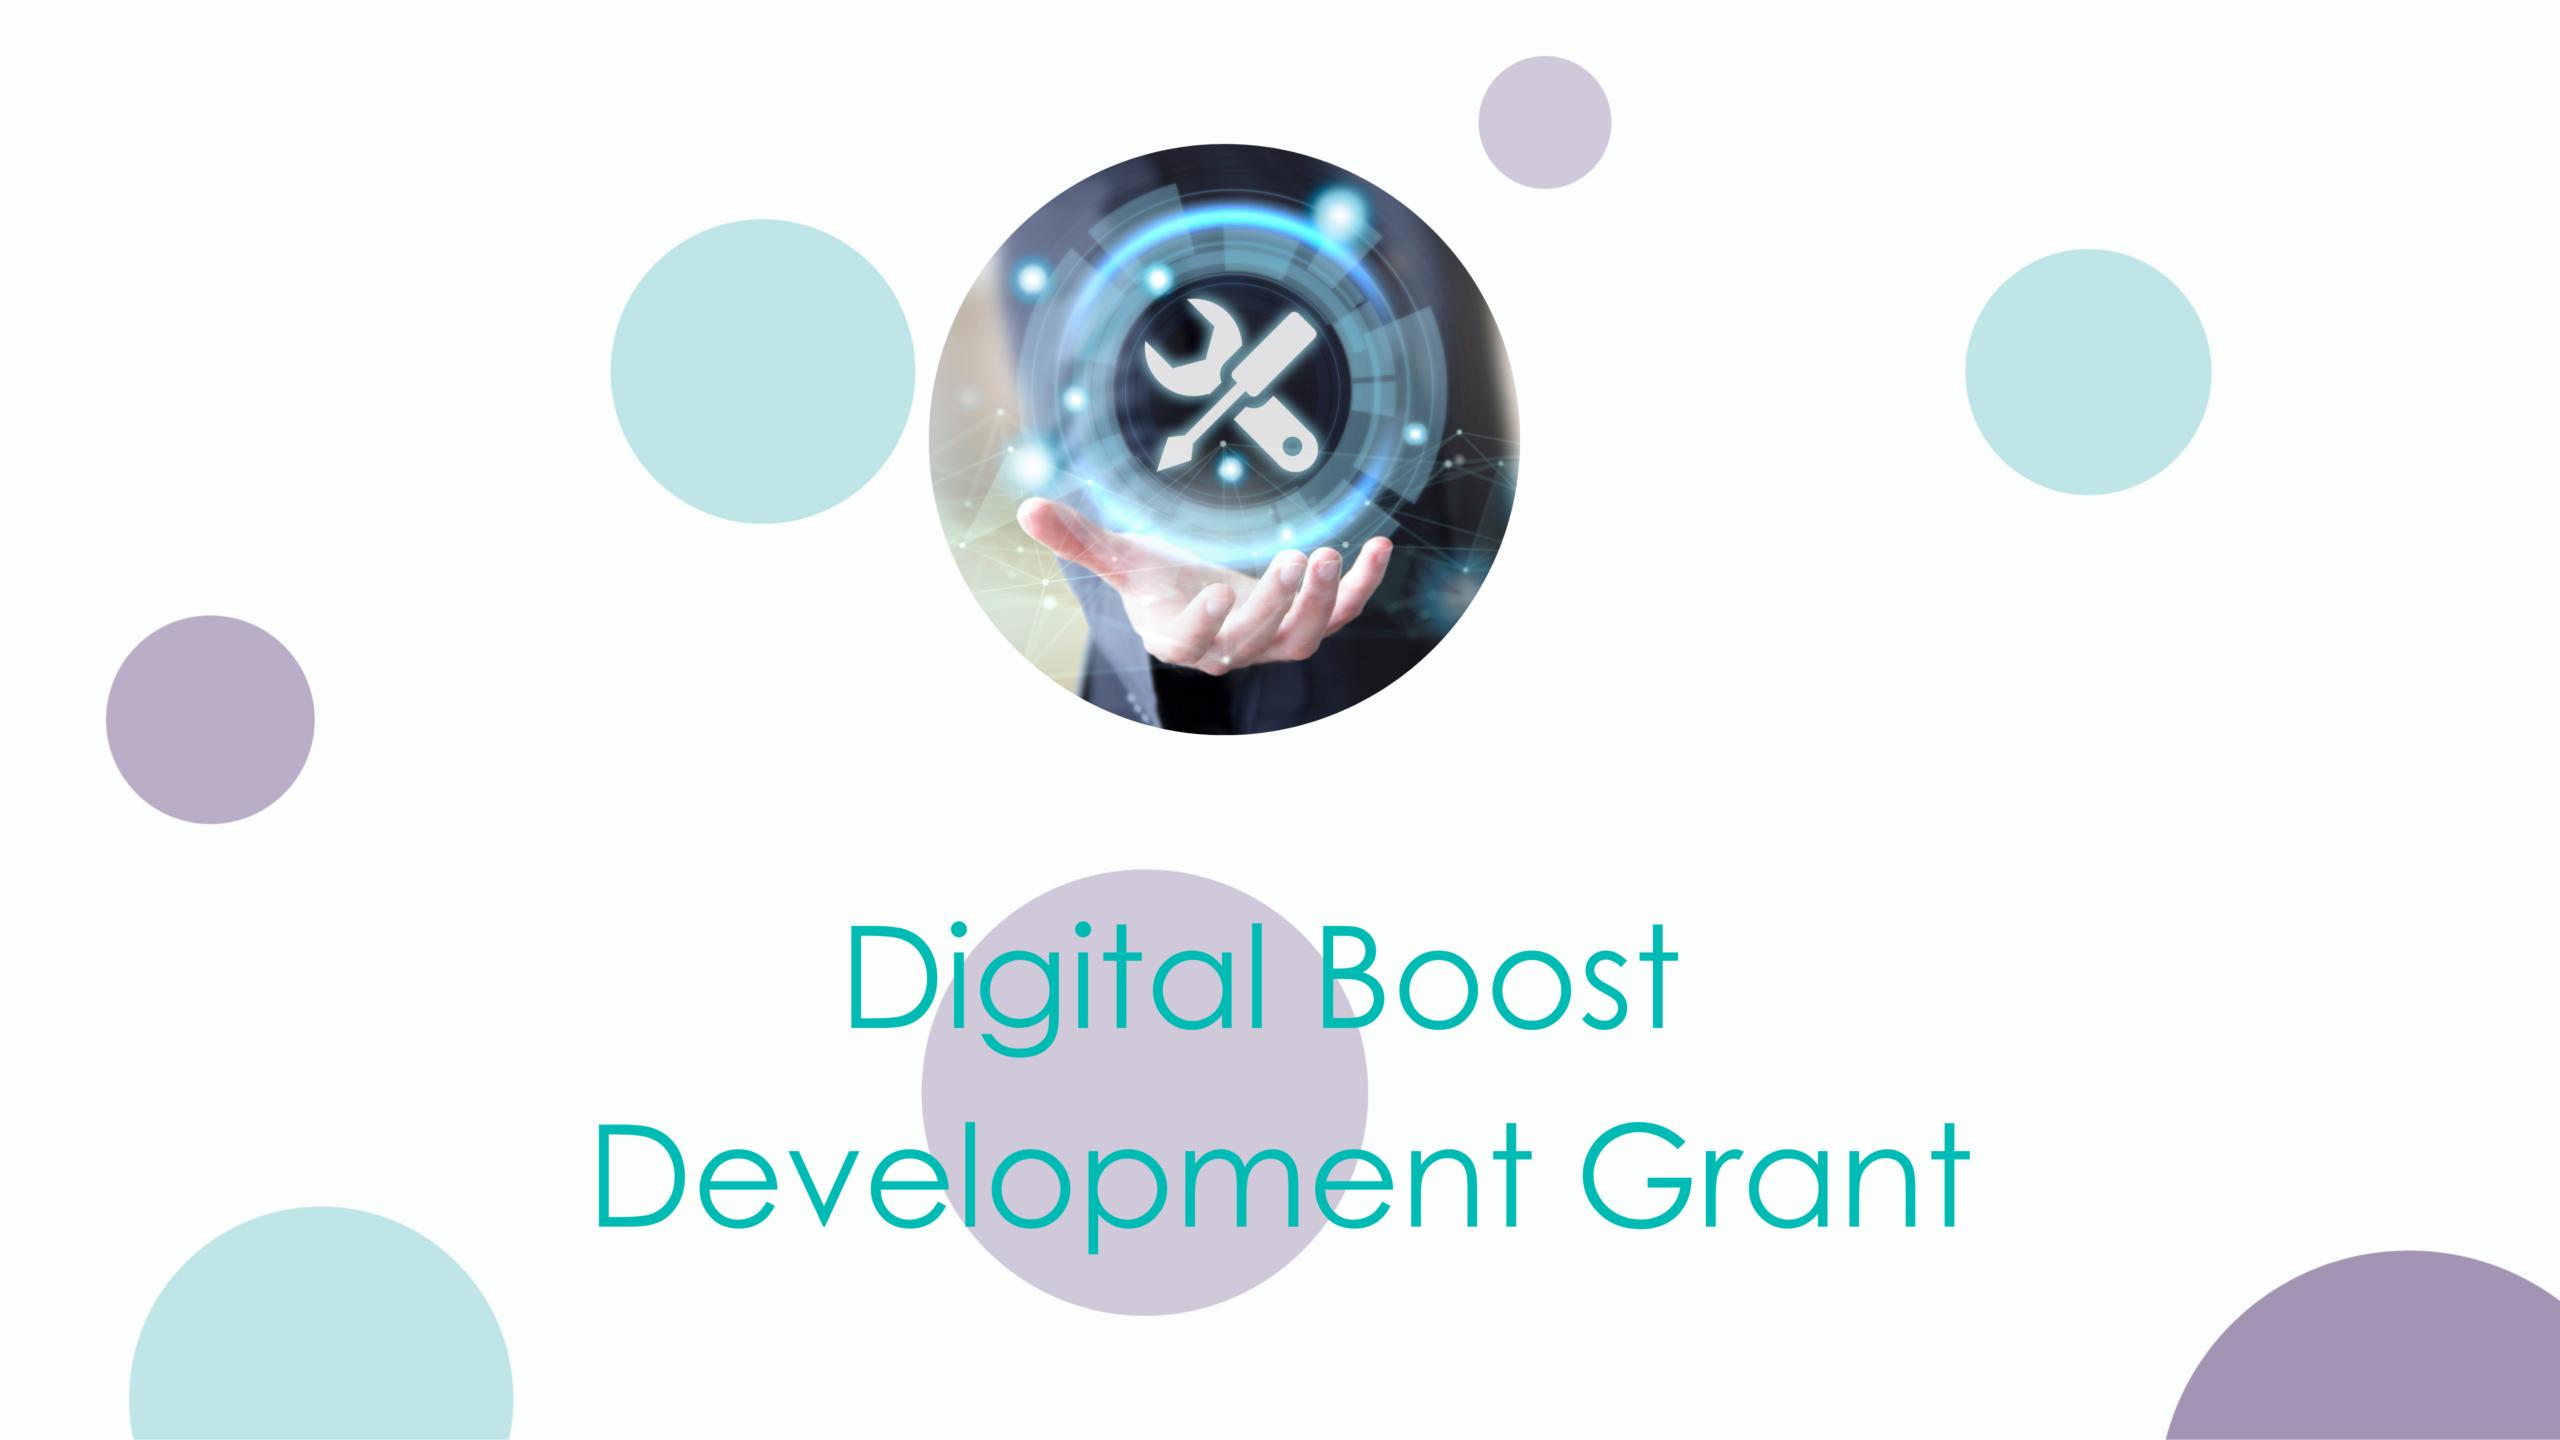 Digital Boost Development Grant In High Demand